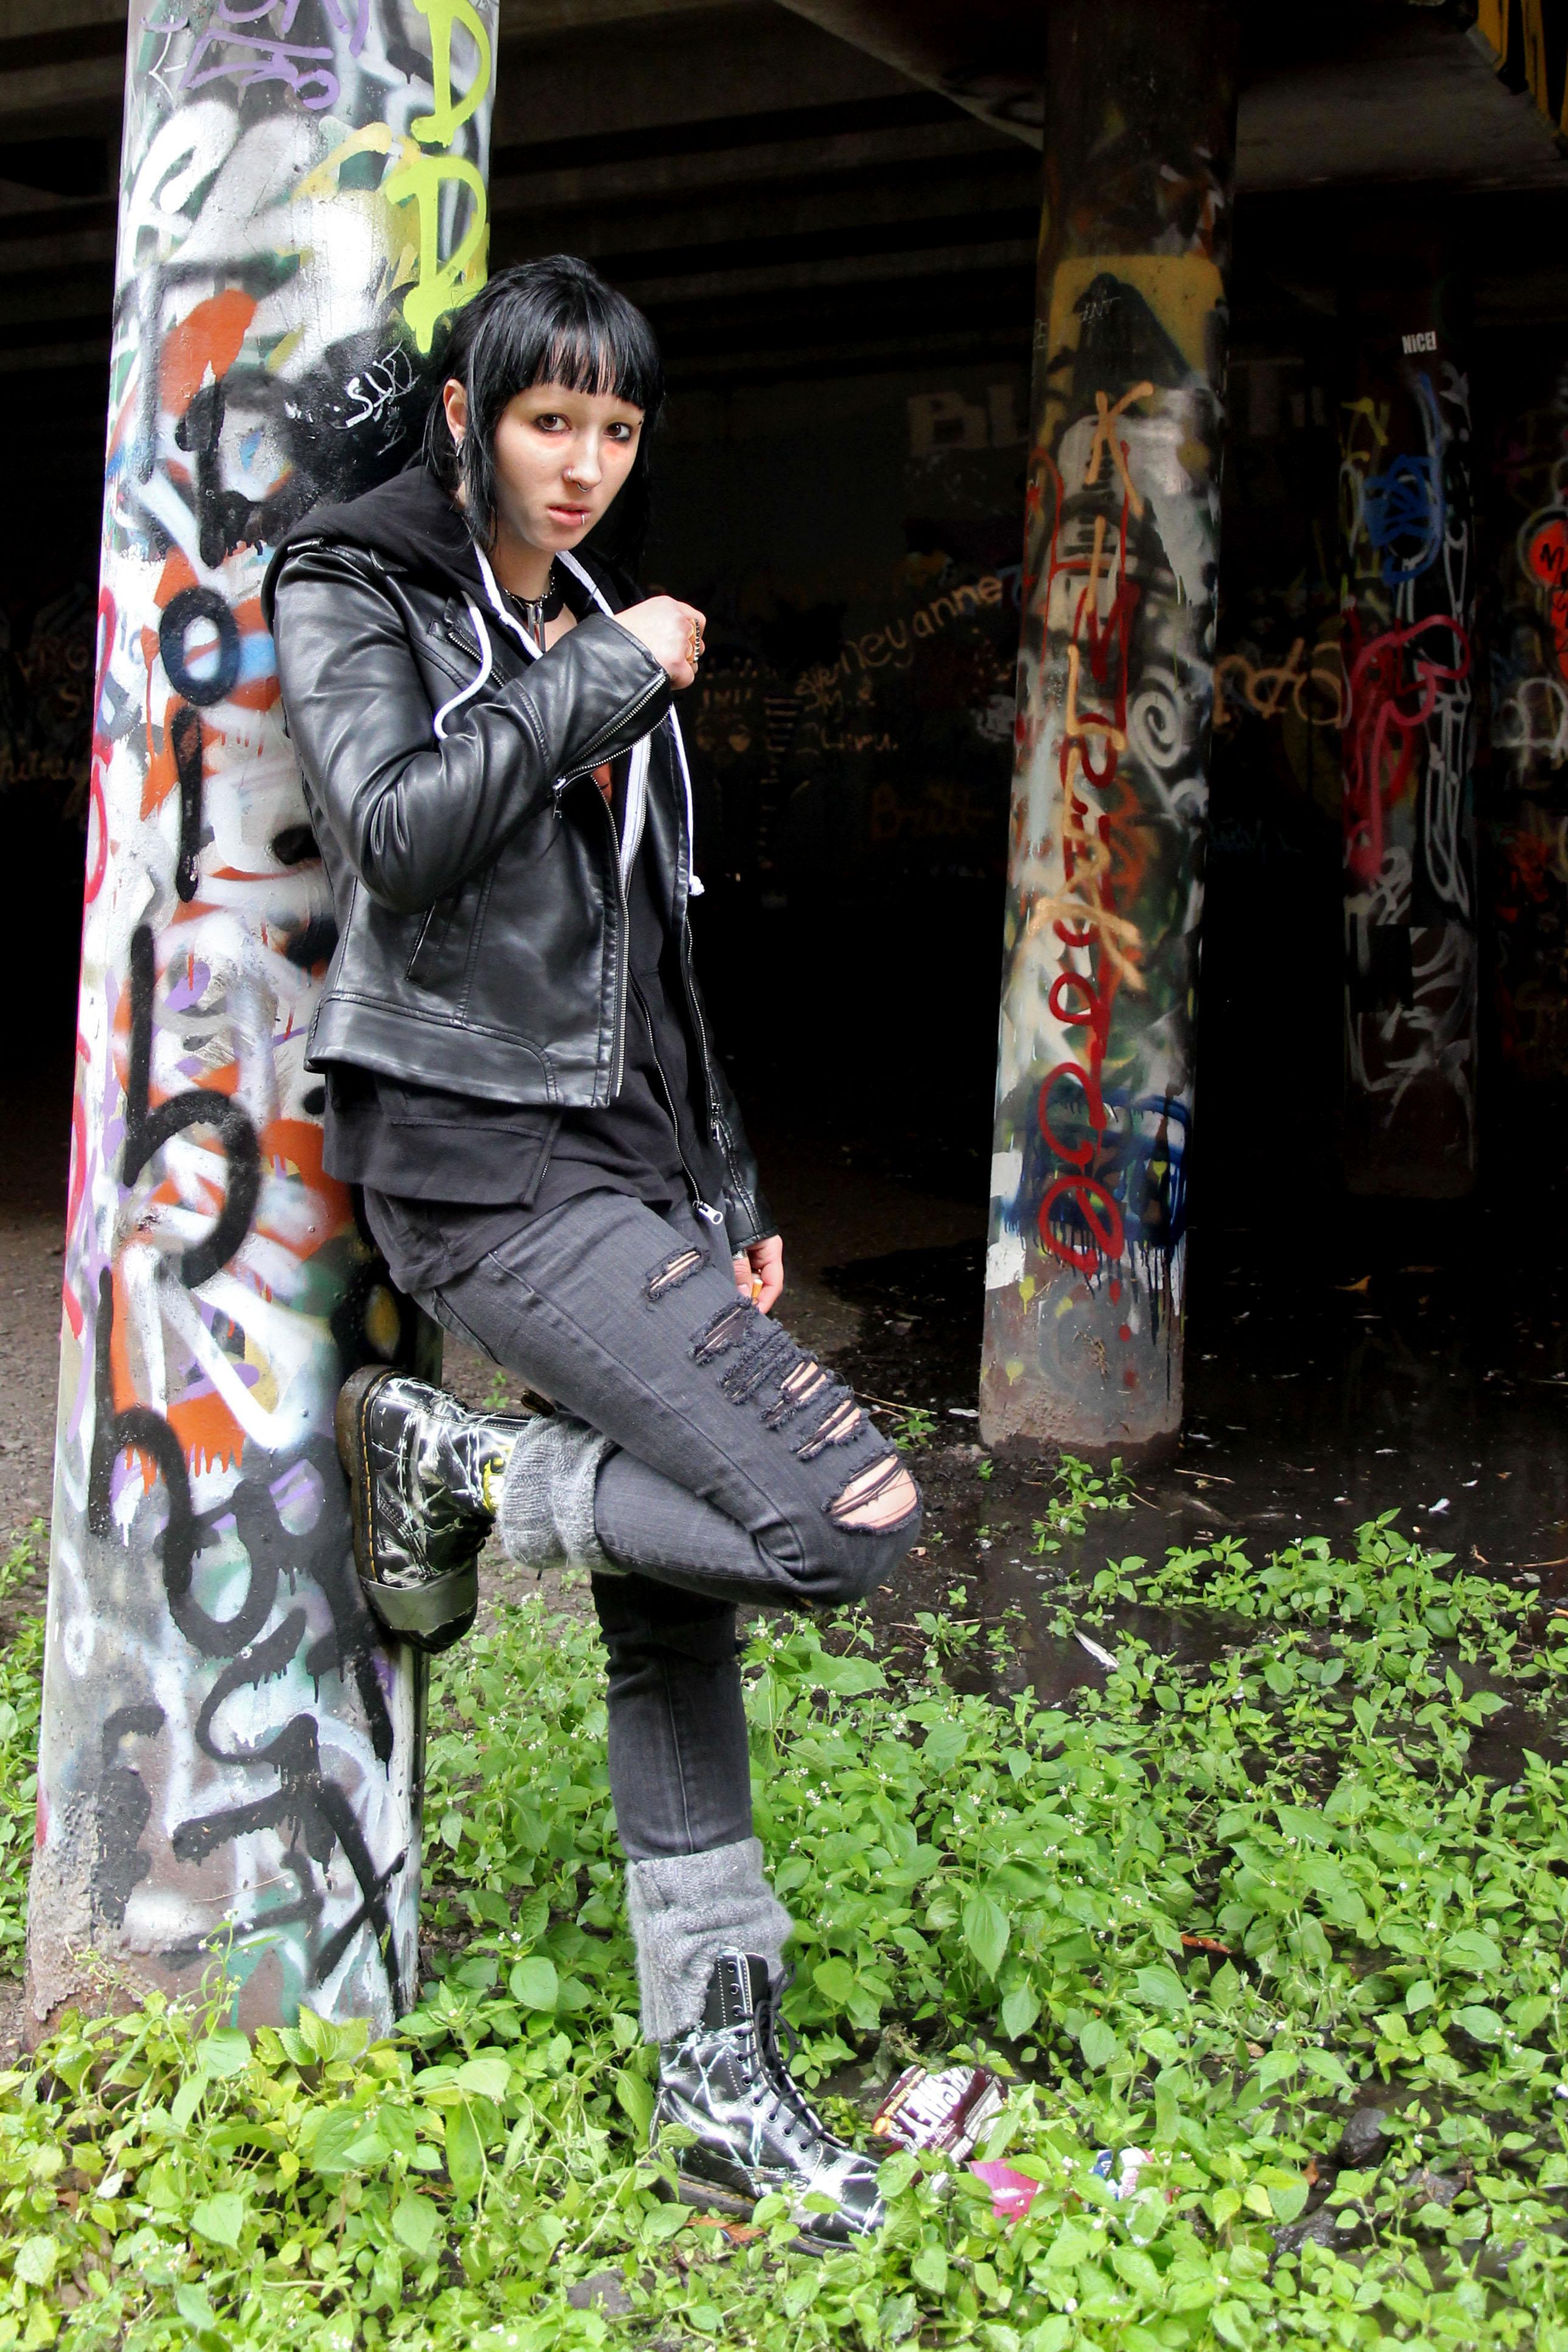 Lisbeth Salander - Girl with the Dragon Tattoo Tutorial